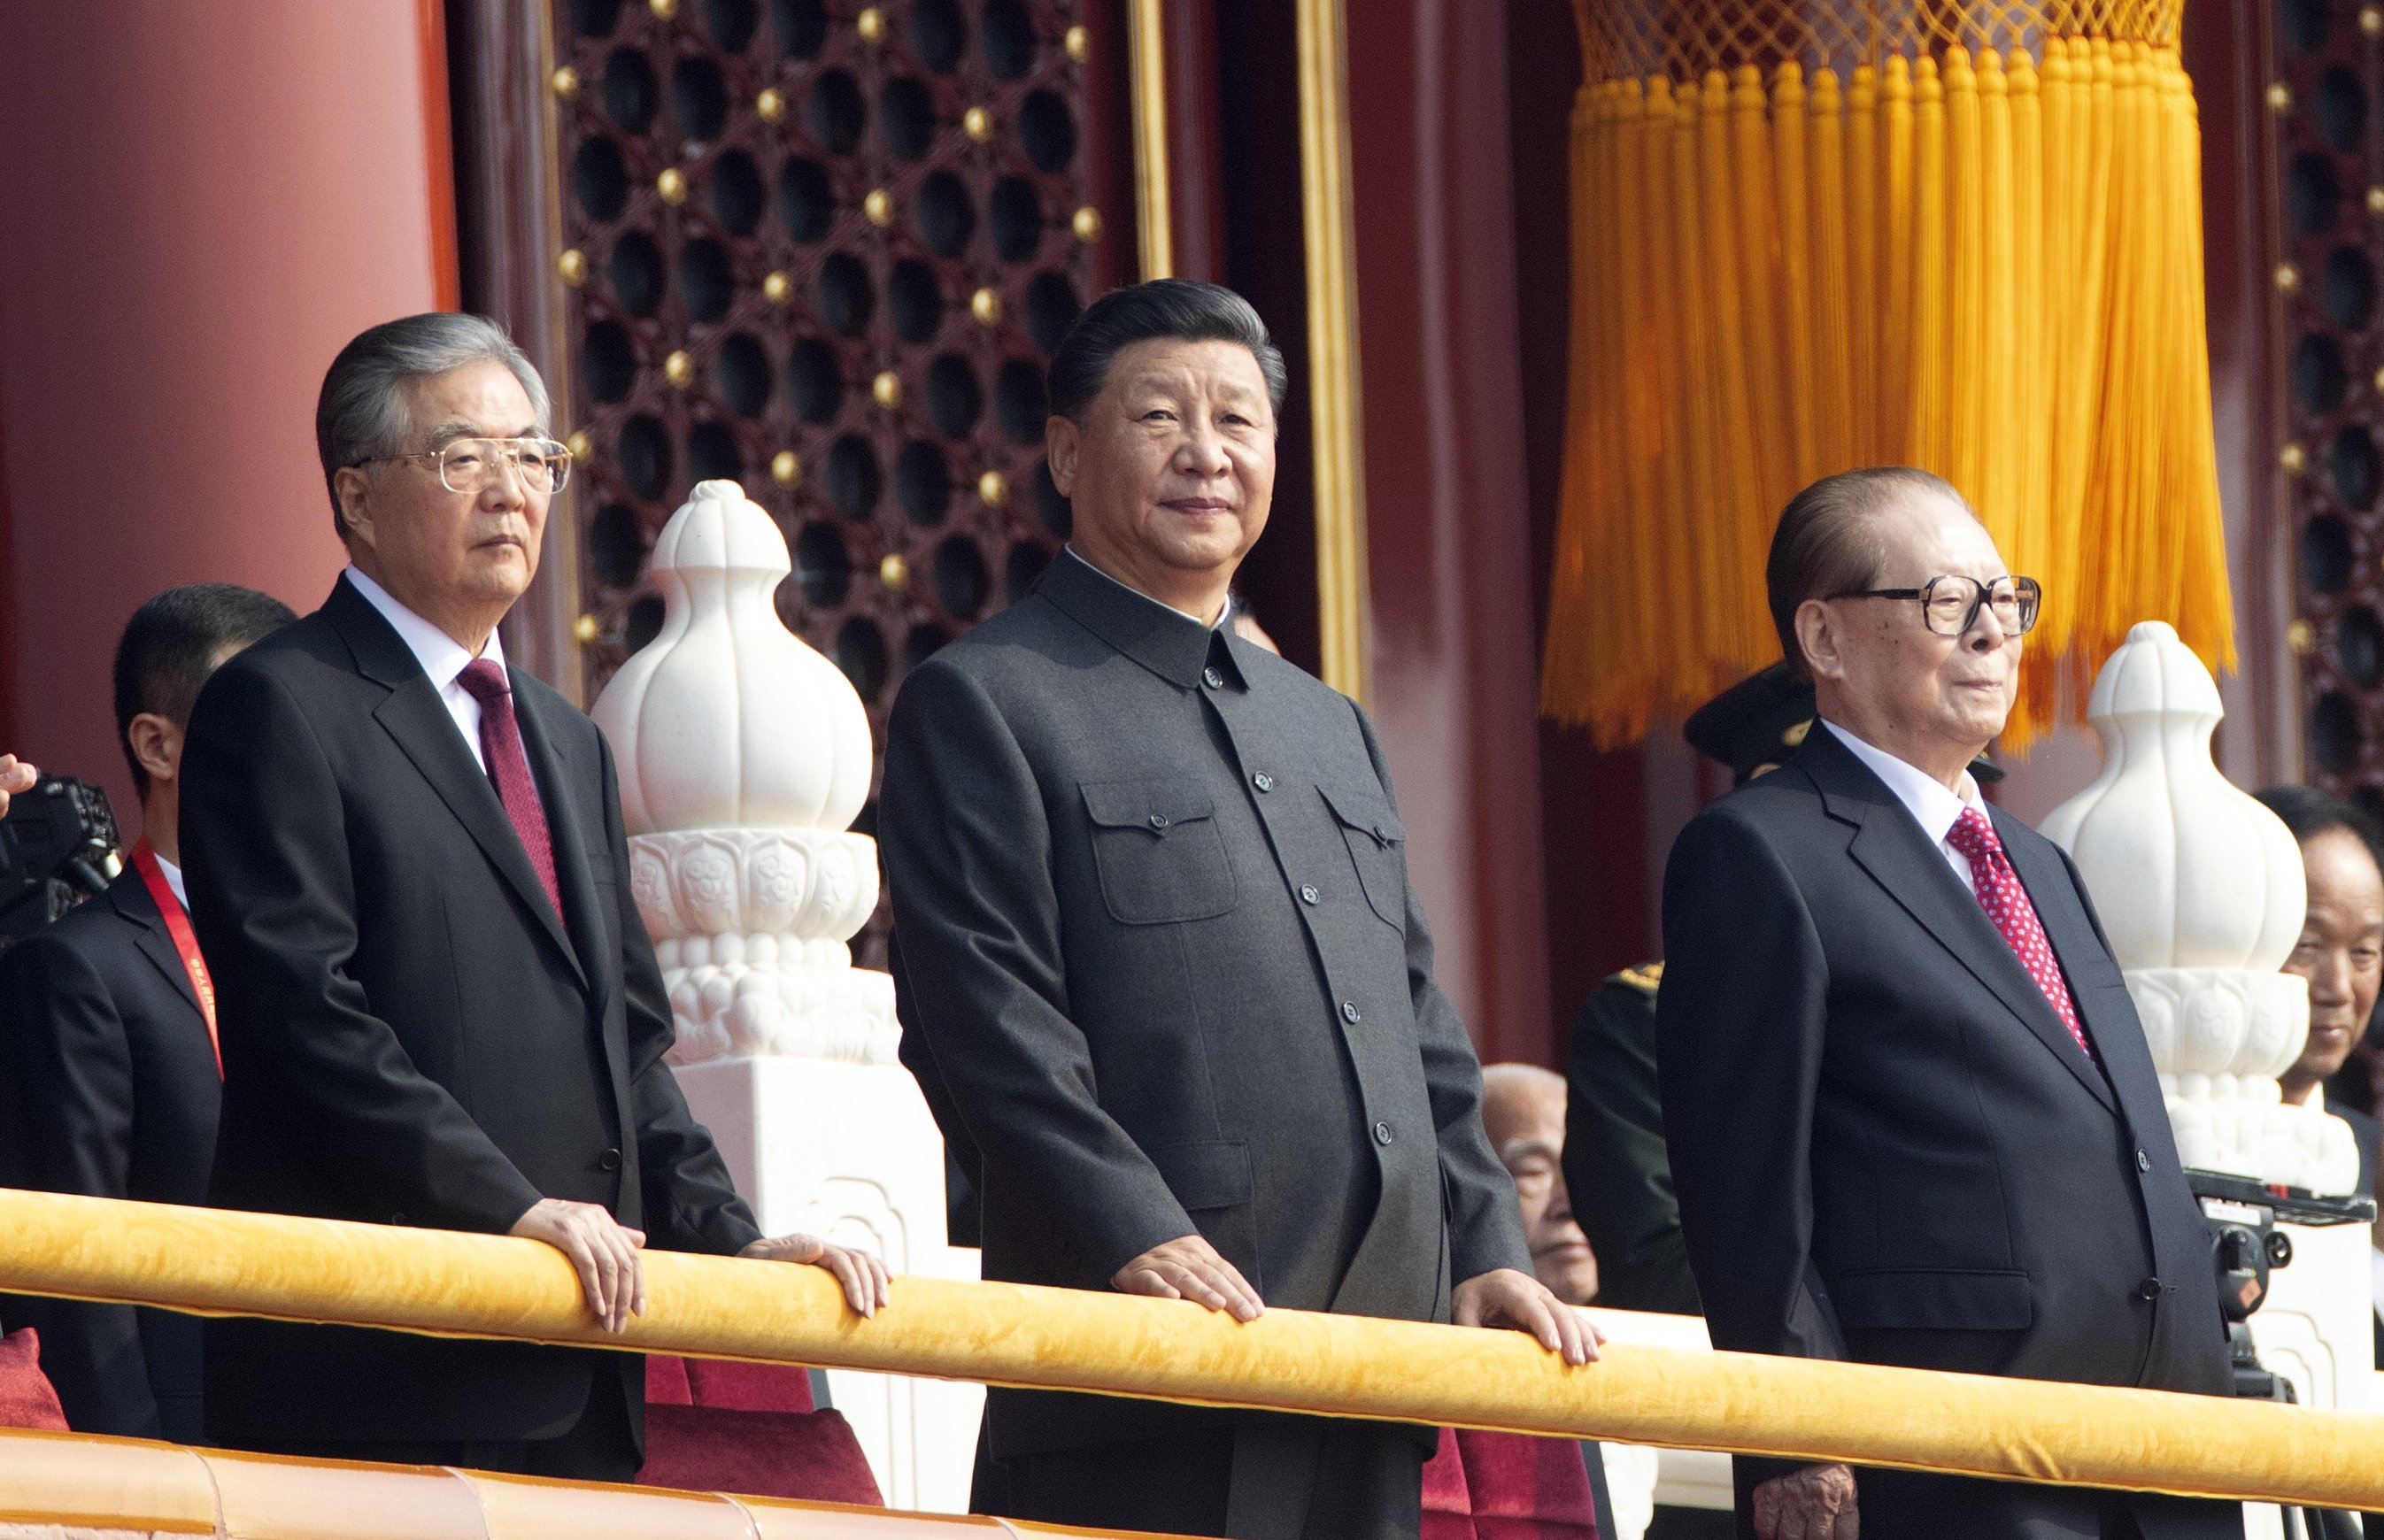 The Latest: North Korea leader praises China relationship